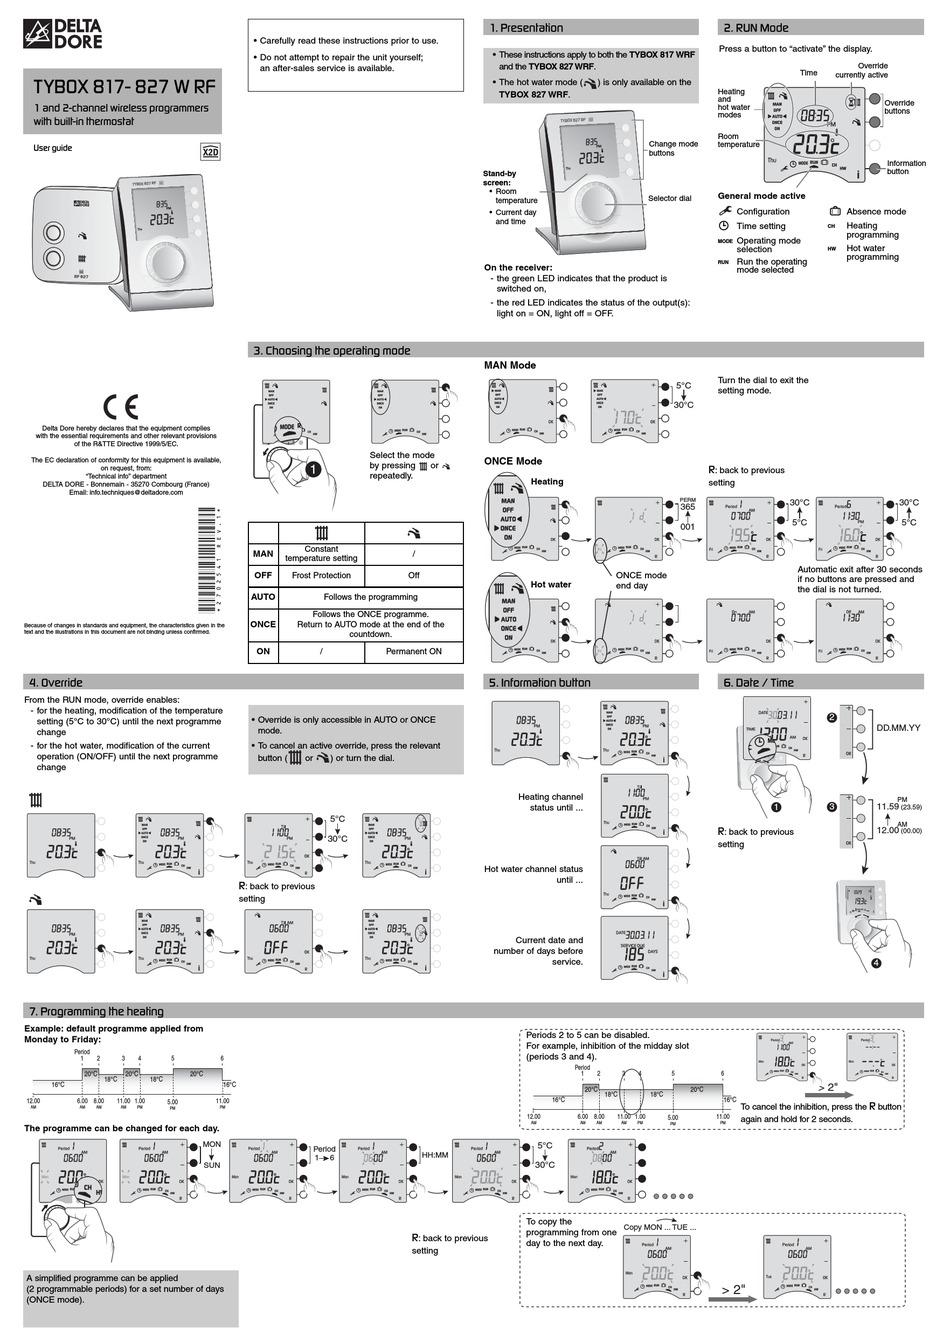 DELTA DORE TYBOX 817- 827 W RF USER MANUAL Pdf Download